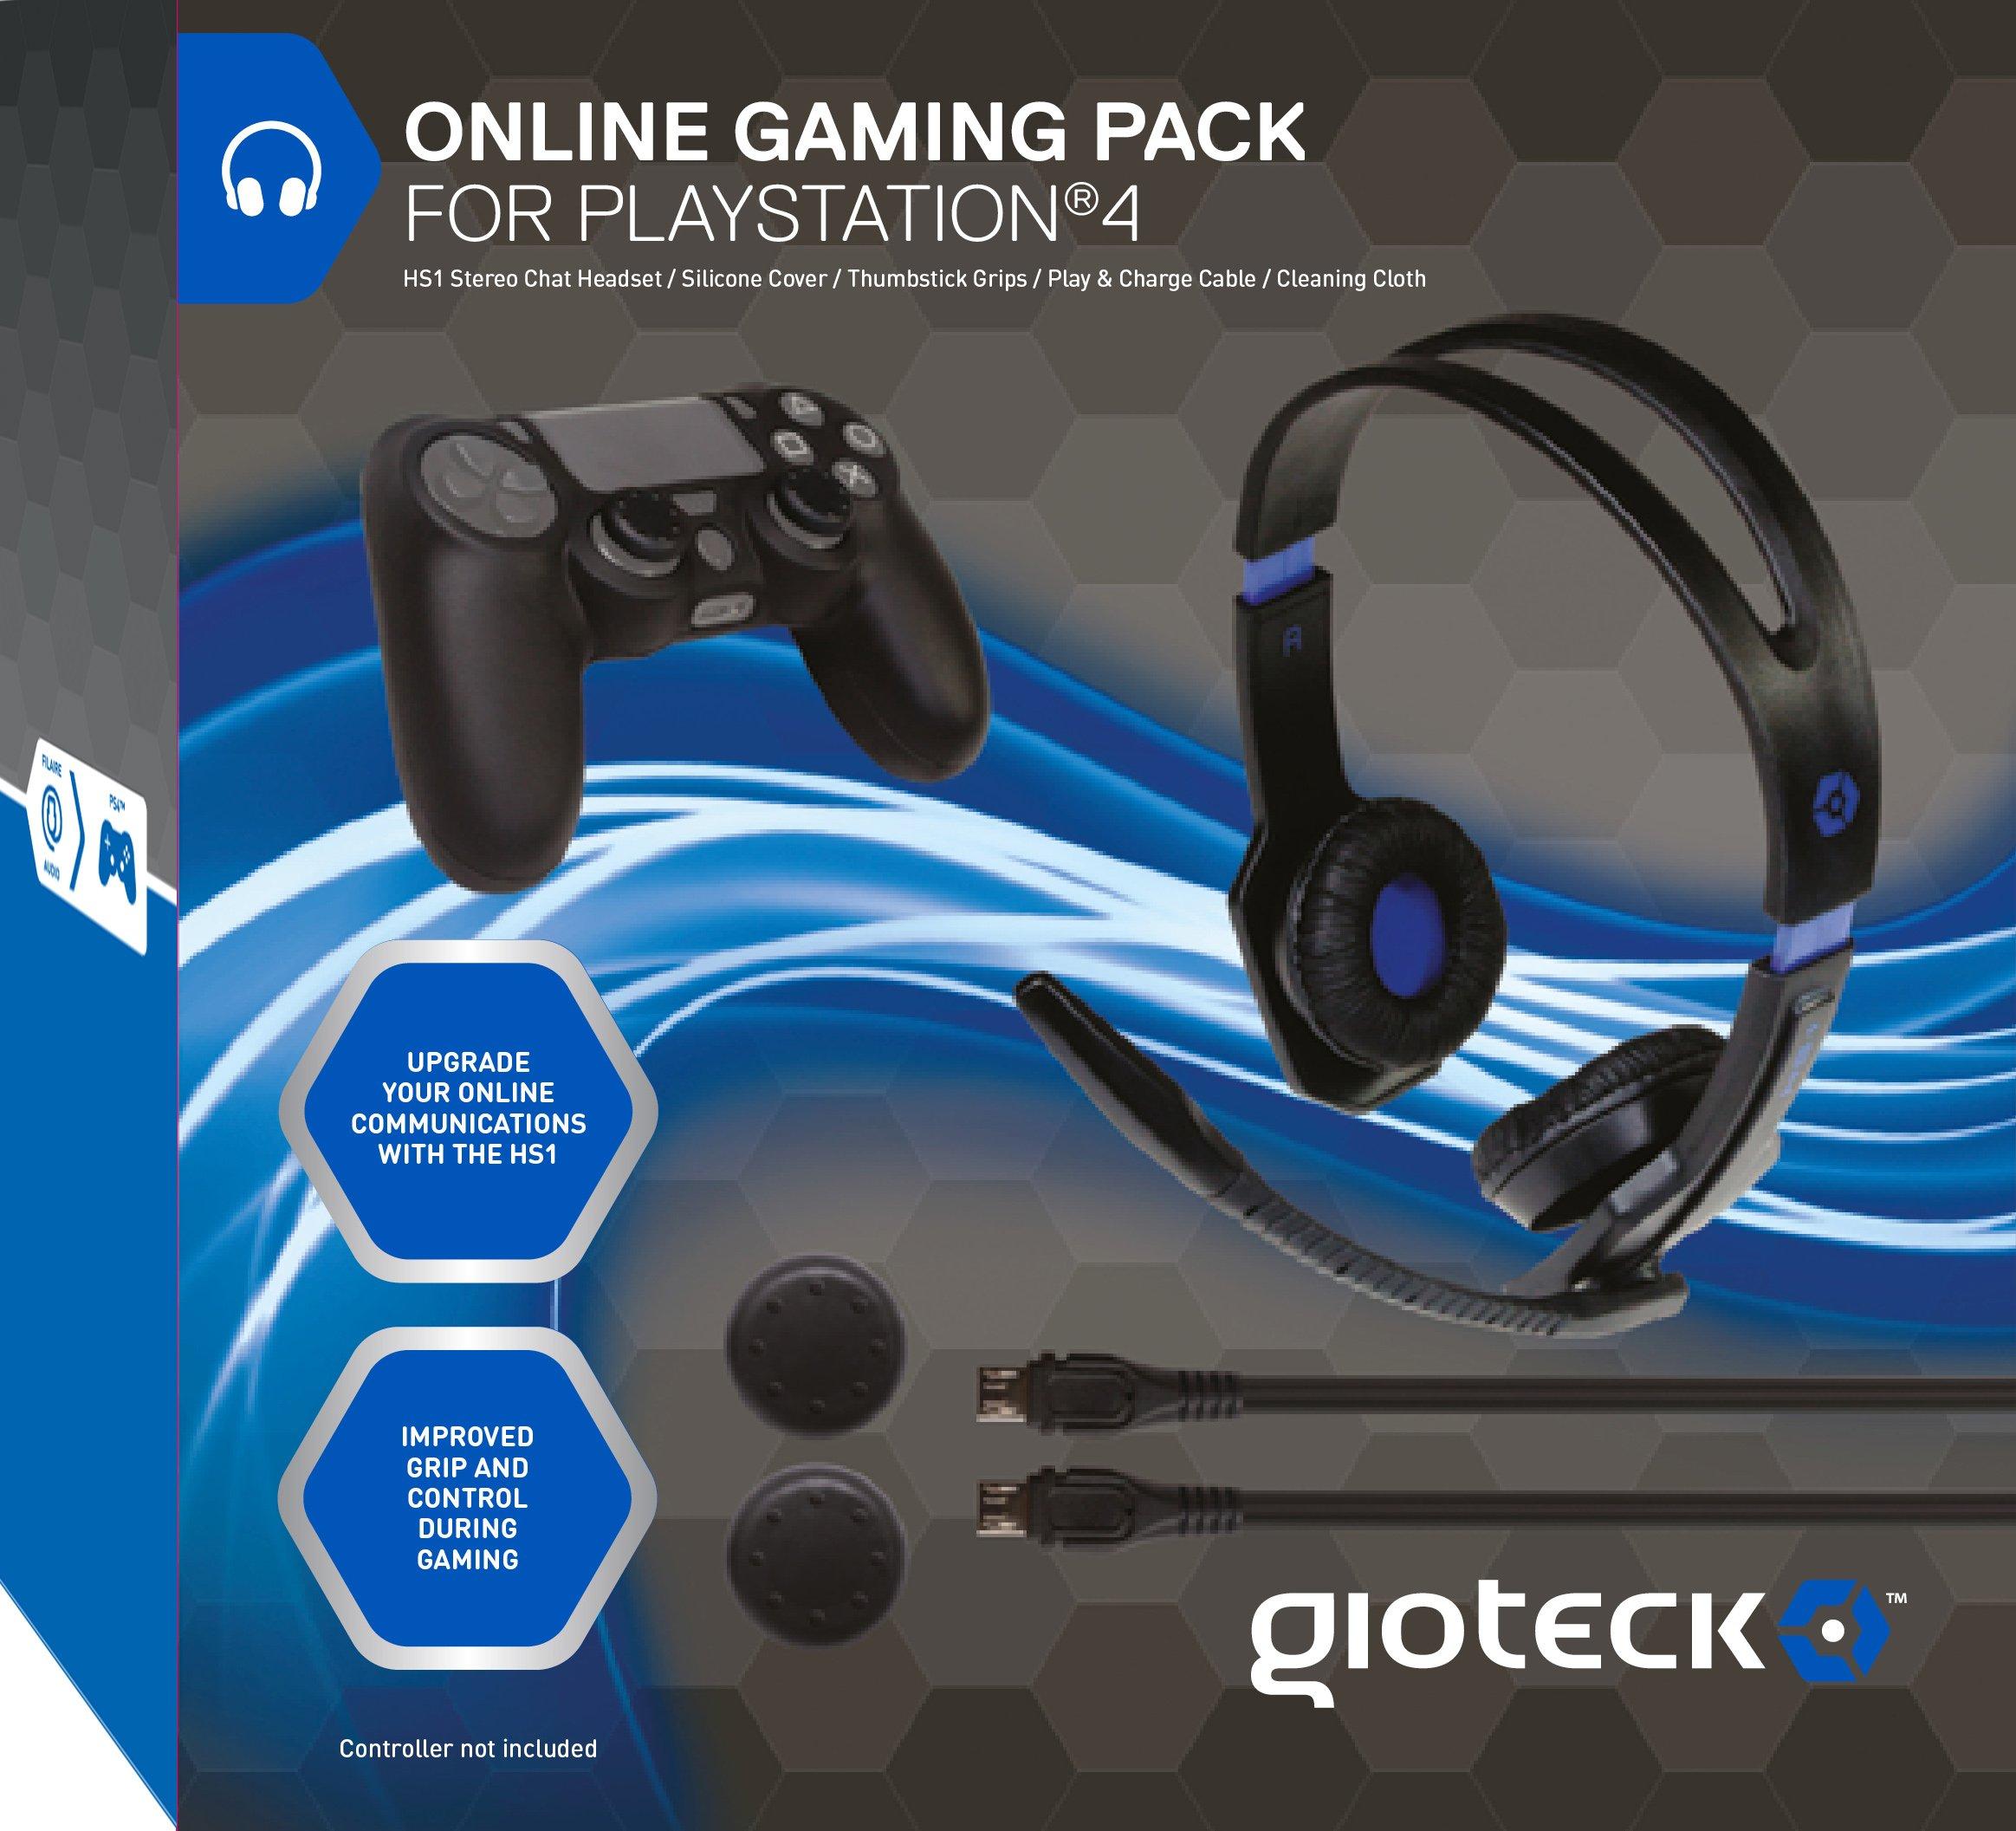 Gioteck - Online Gaming Pack (PlayStation 4): Amazon.es: Videojuegos